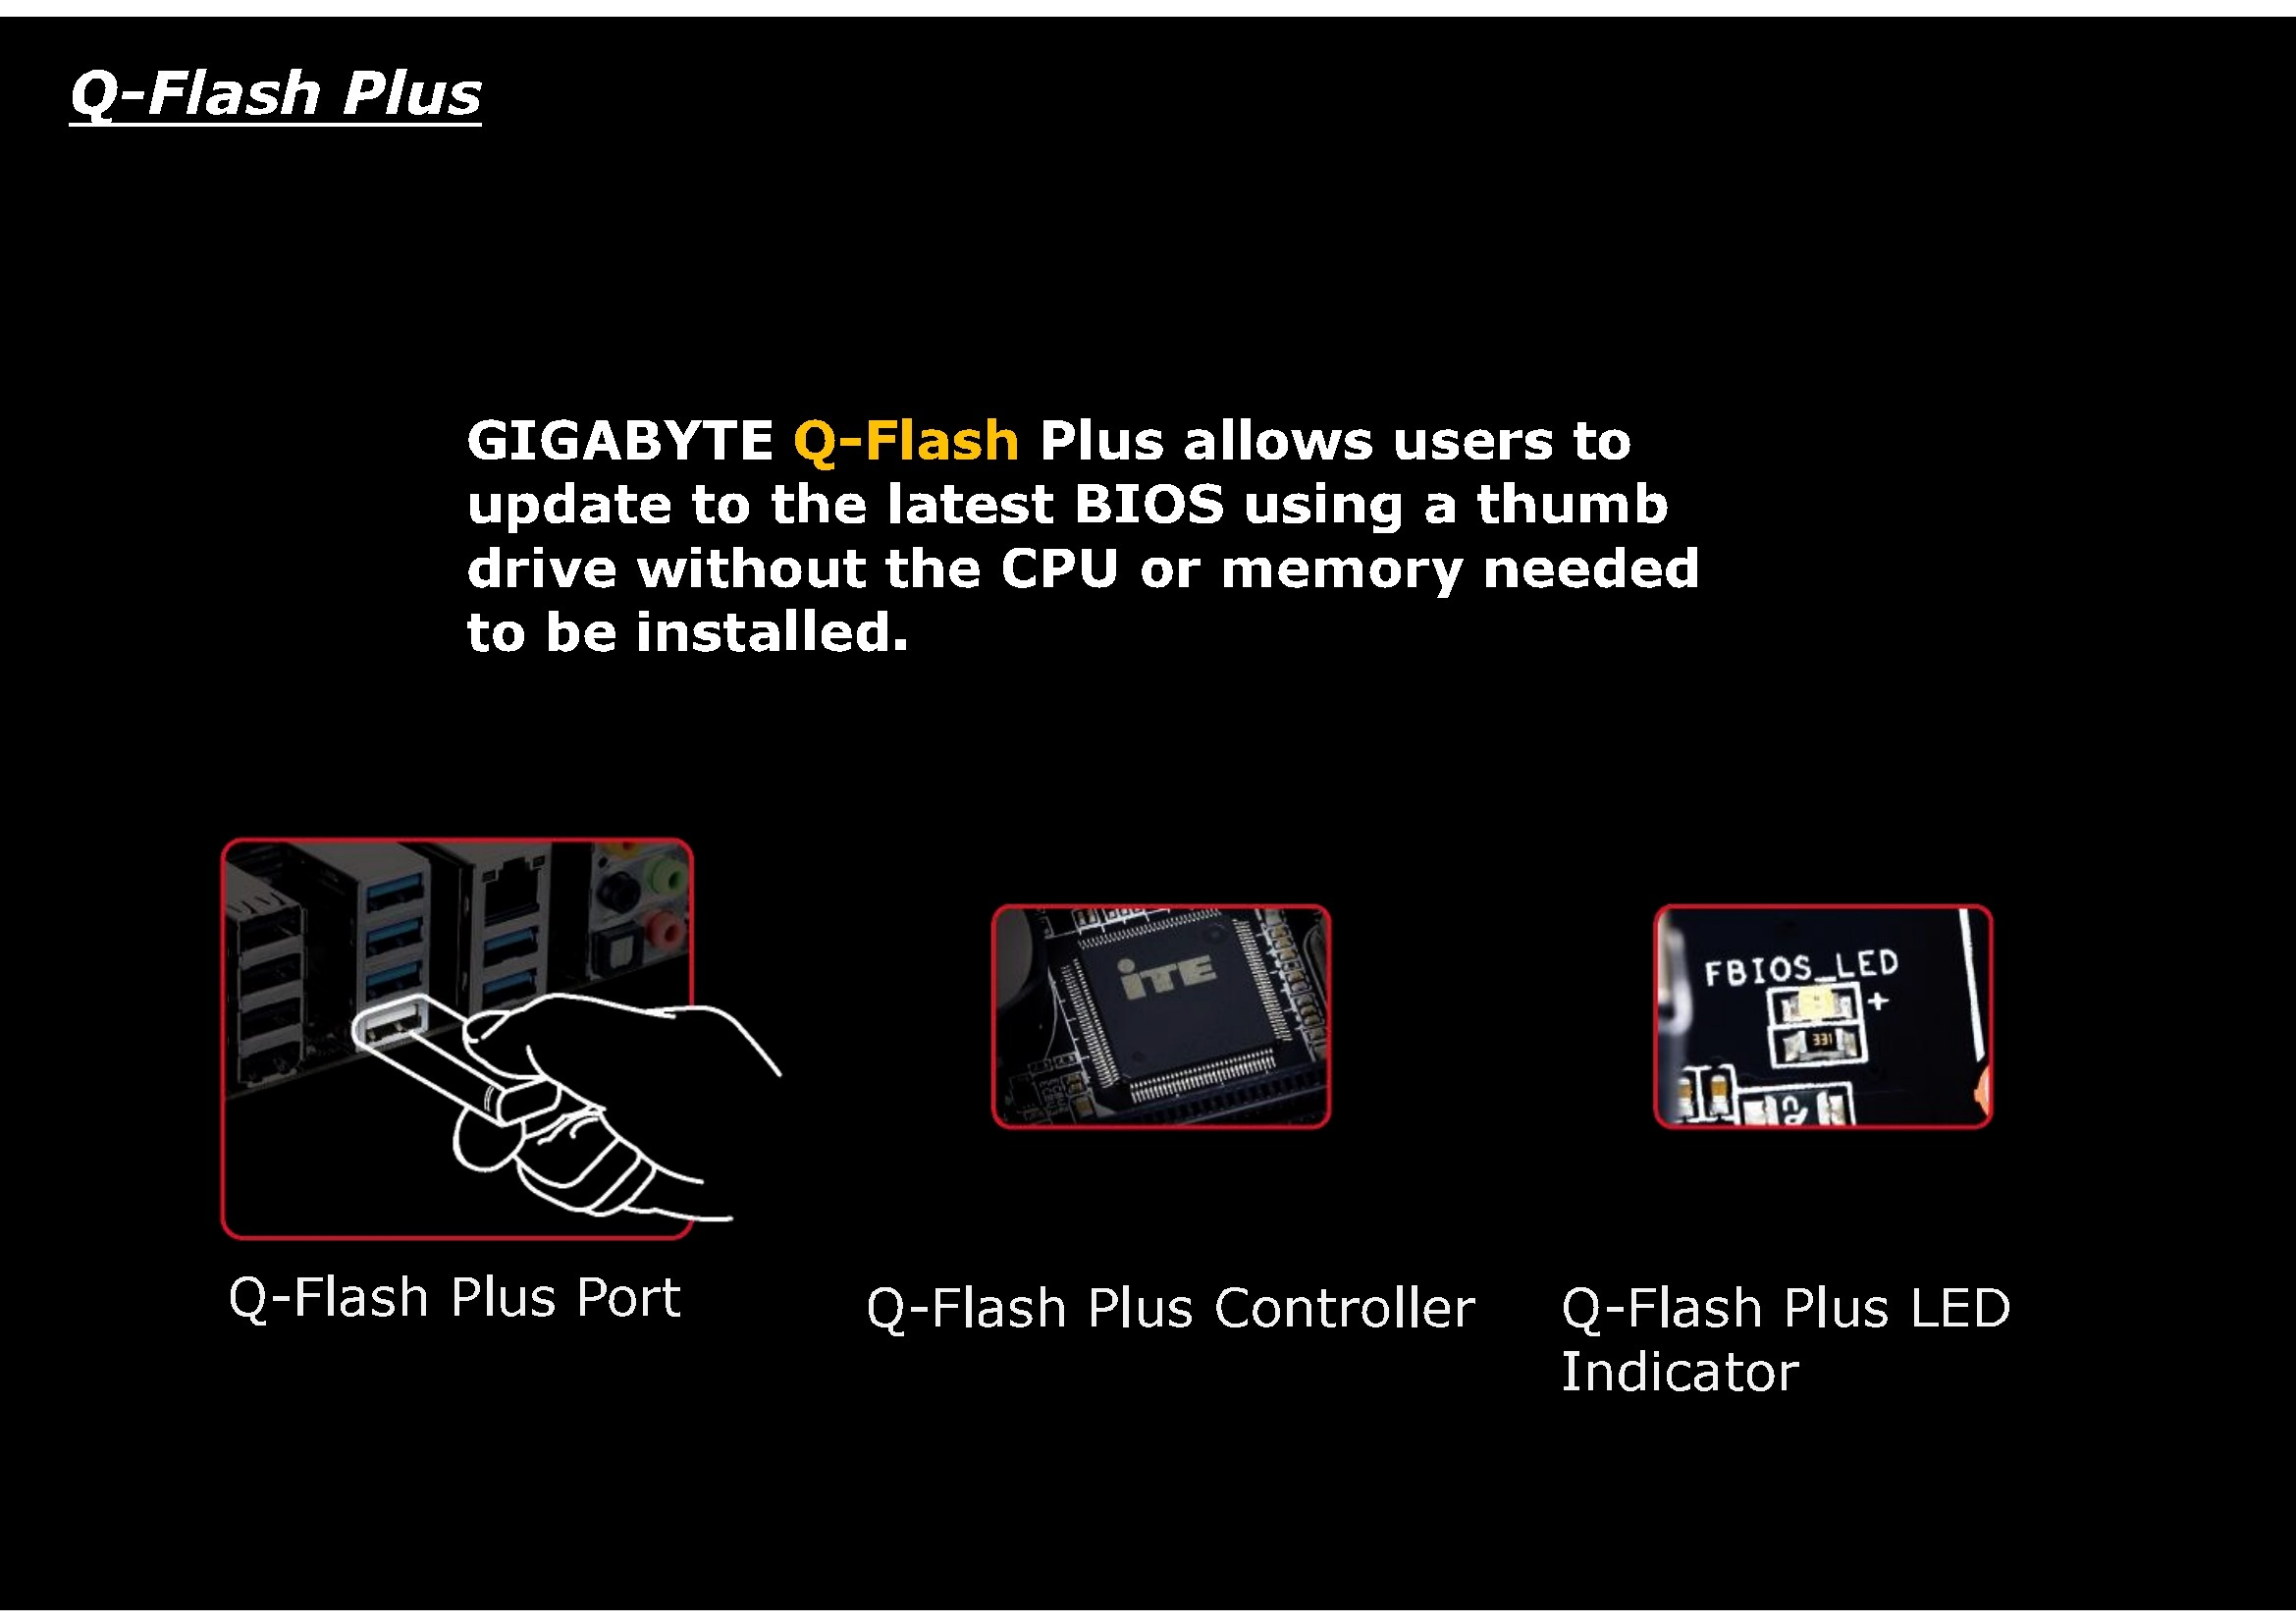 Gigabyte's Impressive Z170X SOC Force Motherboard Unveiled